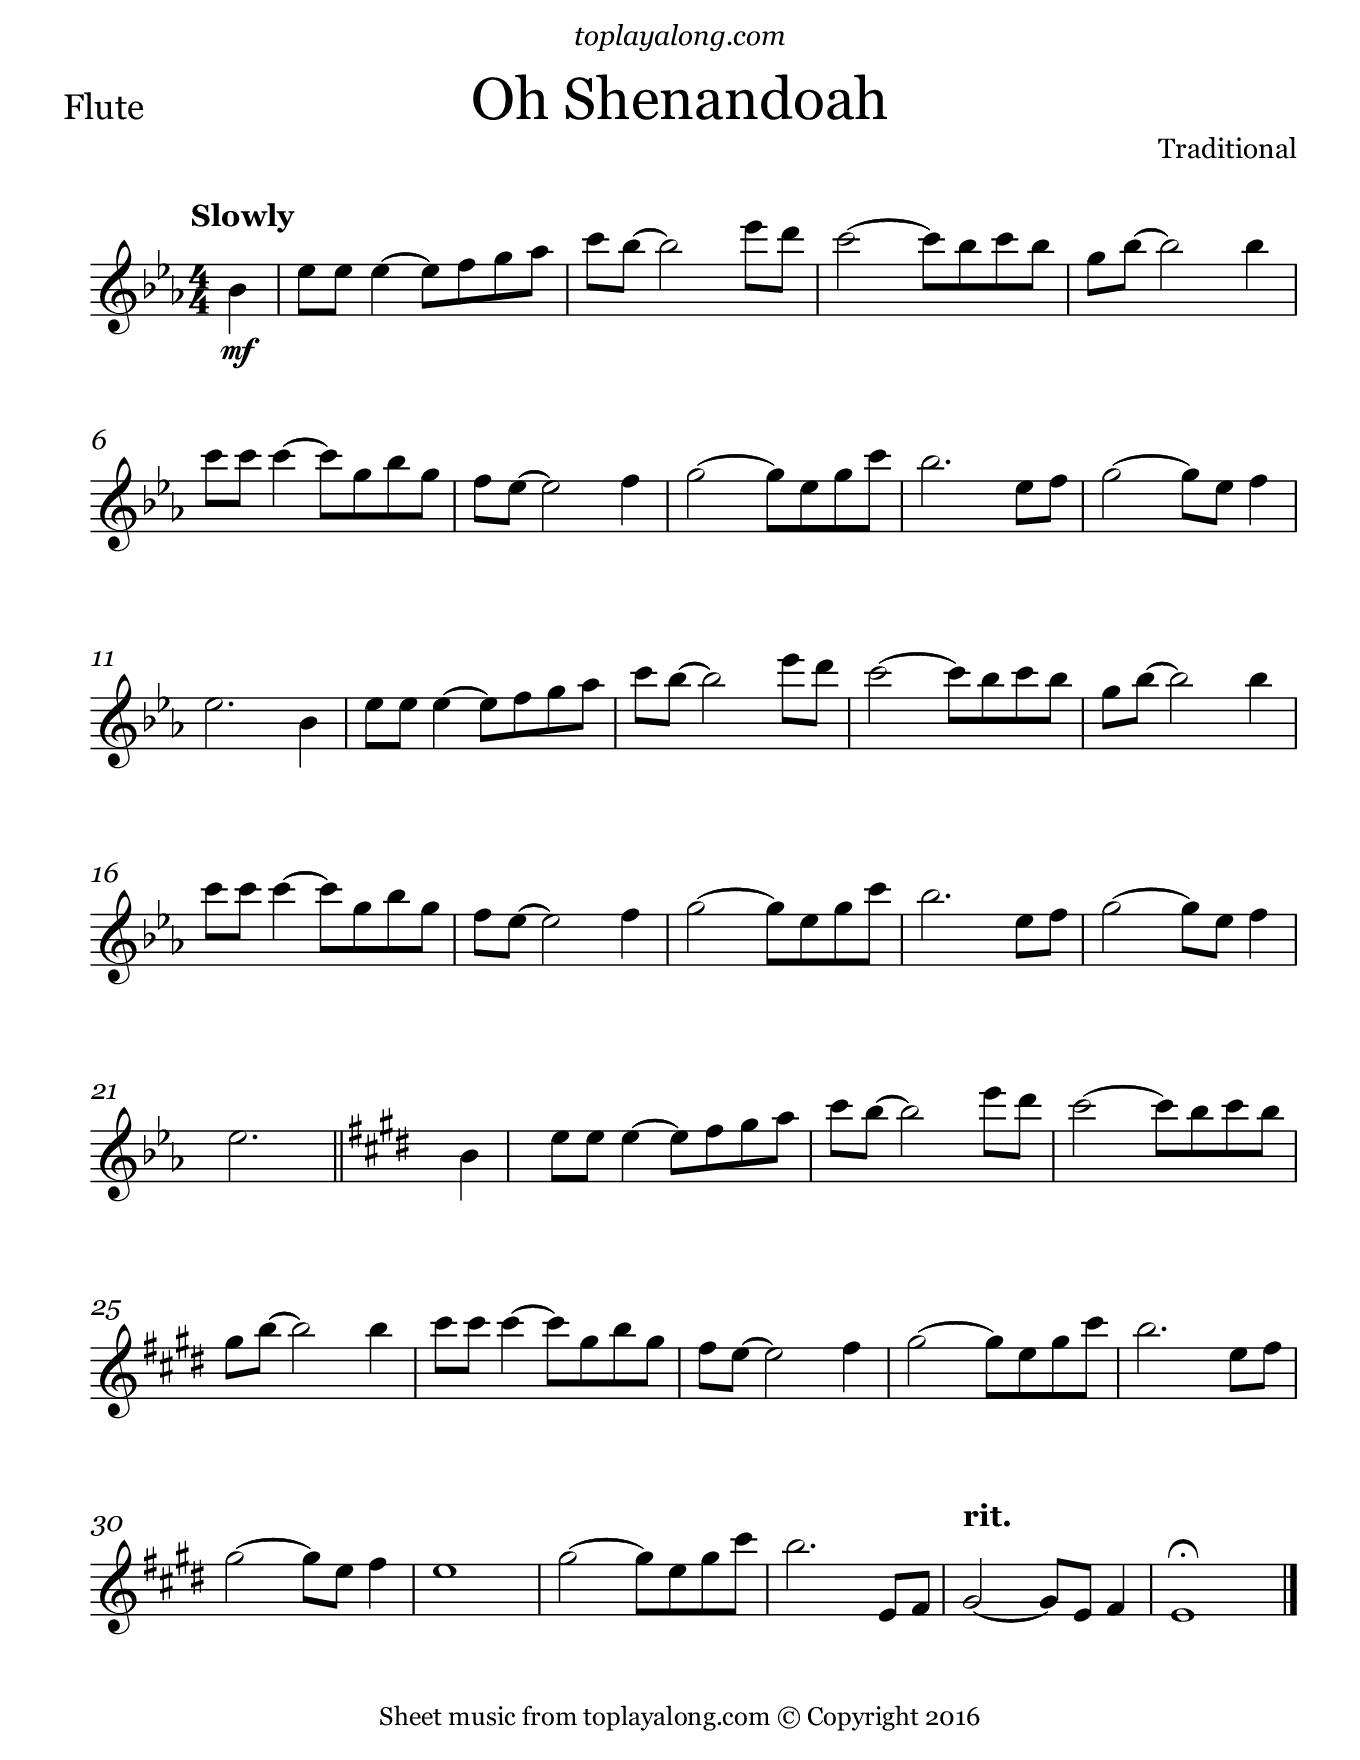 Oh Shenandoah. Sheet music for Flute, page 1.